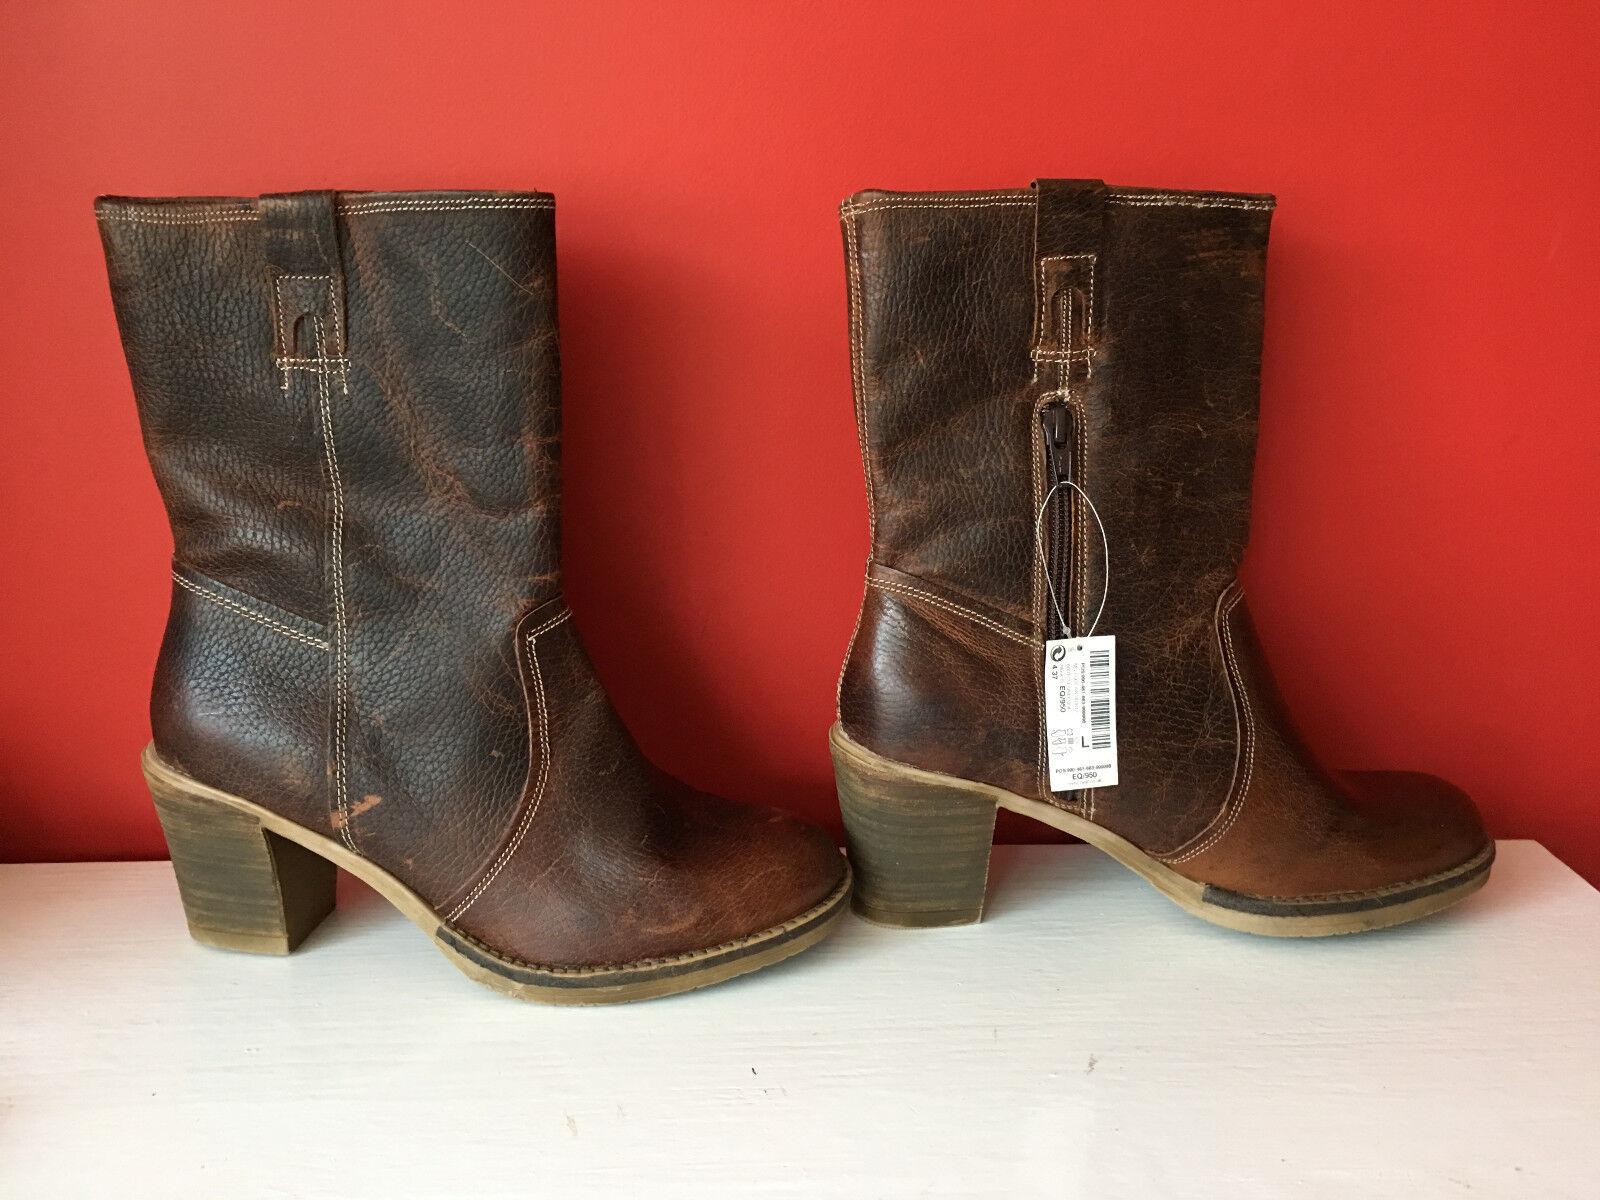 NEXT Braun Distressed Leder Casual Pull On Block Heel Casual Leder Stiefel UK 4 EU 37 BNWOB 817b1d